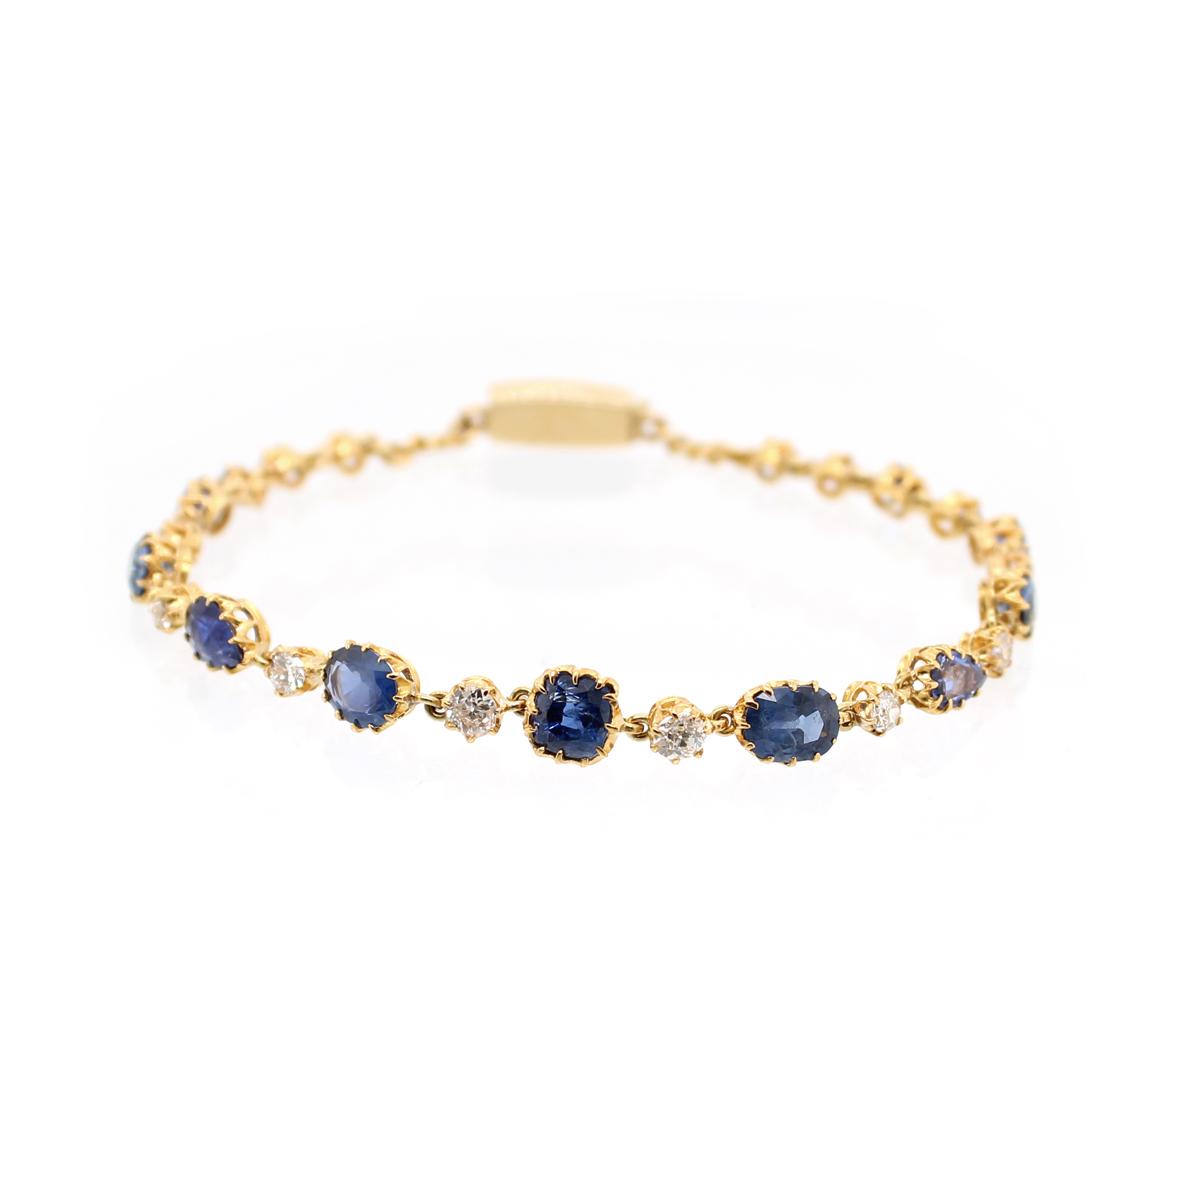 Estate 18 Karat Yellow Gold Diamond and Sapphire Link Bracelet